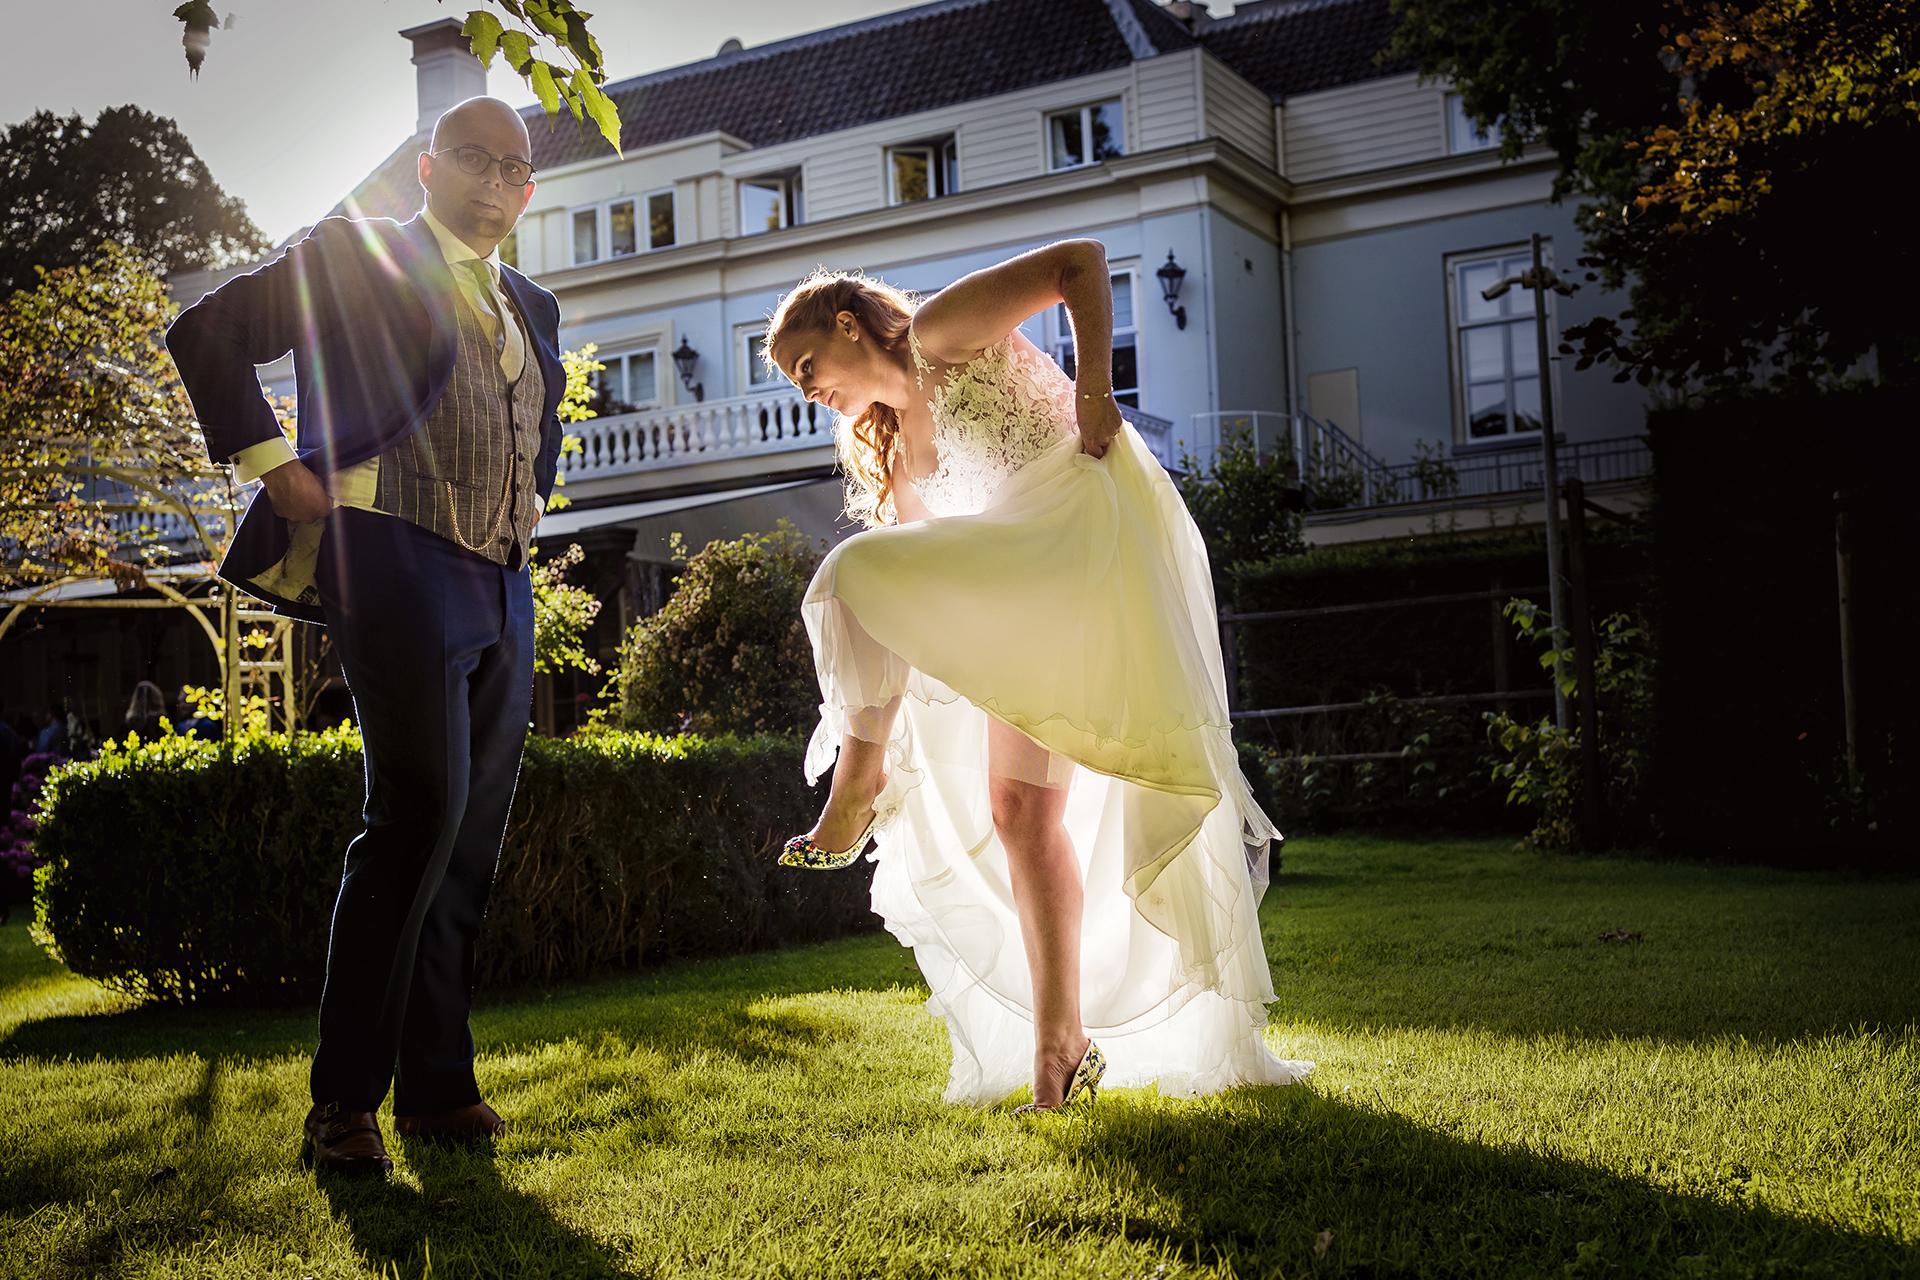 Bride adjusting her shoe - photo by Studio Damon Photography